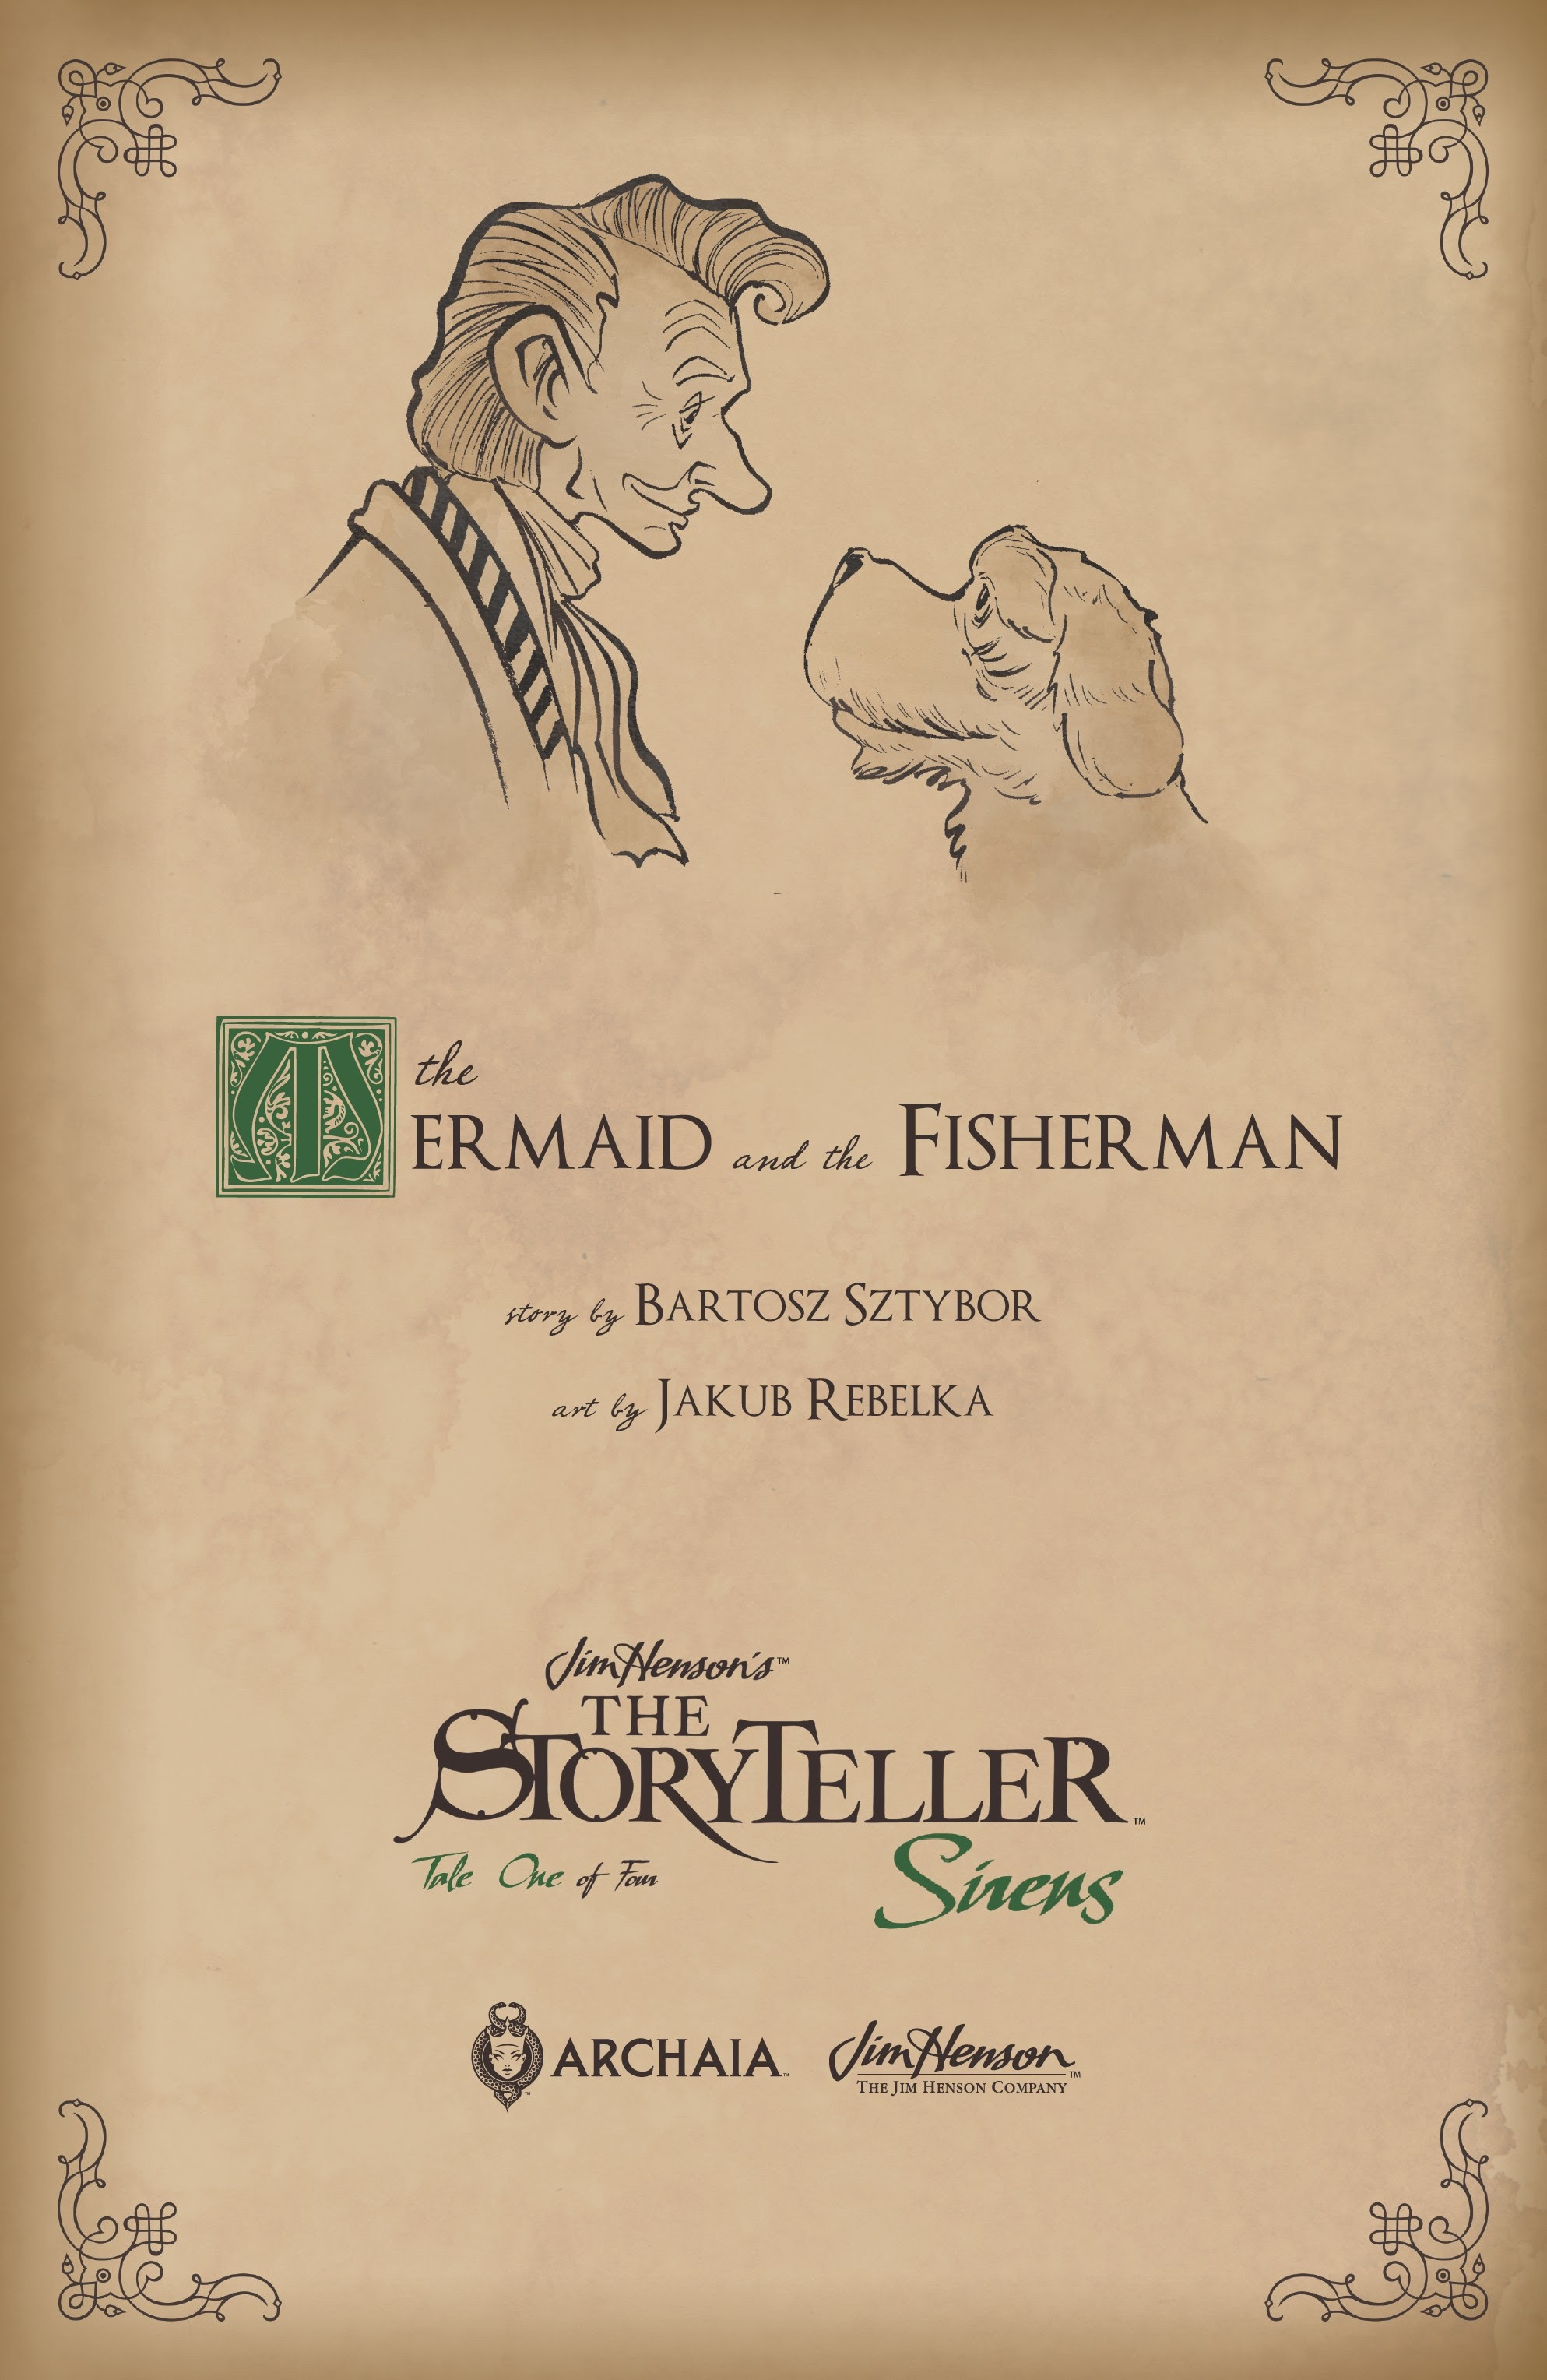 Jim Hensons The Storyteller: Sirens 1 Page 28